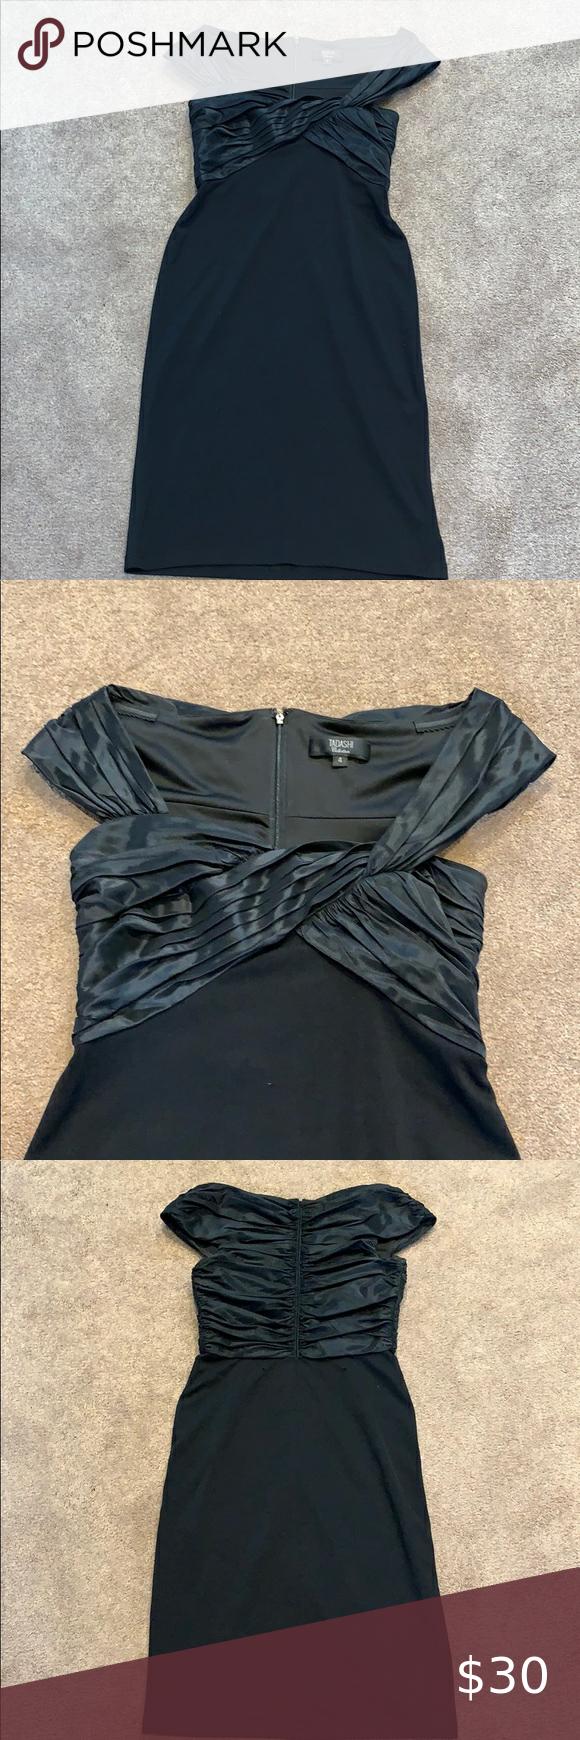 Tadashi Little Black Dress Little Black Dress Flattering Dresses Dresses [ 1740 x 580 Pixel ]